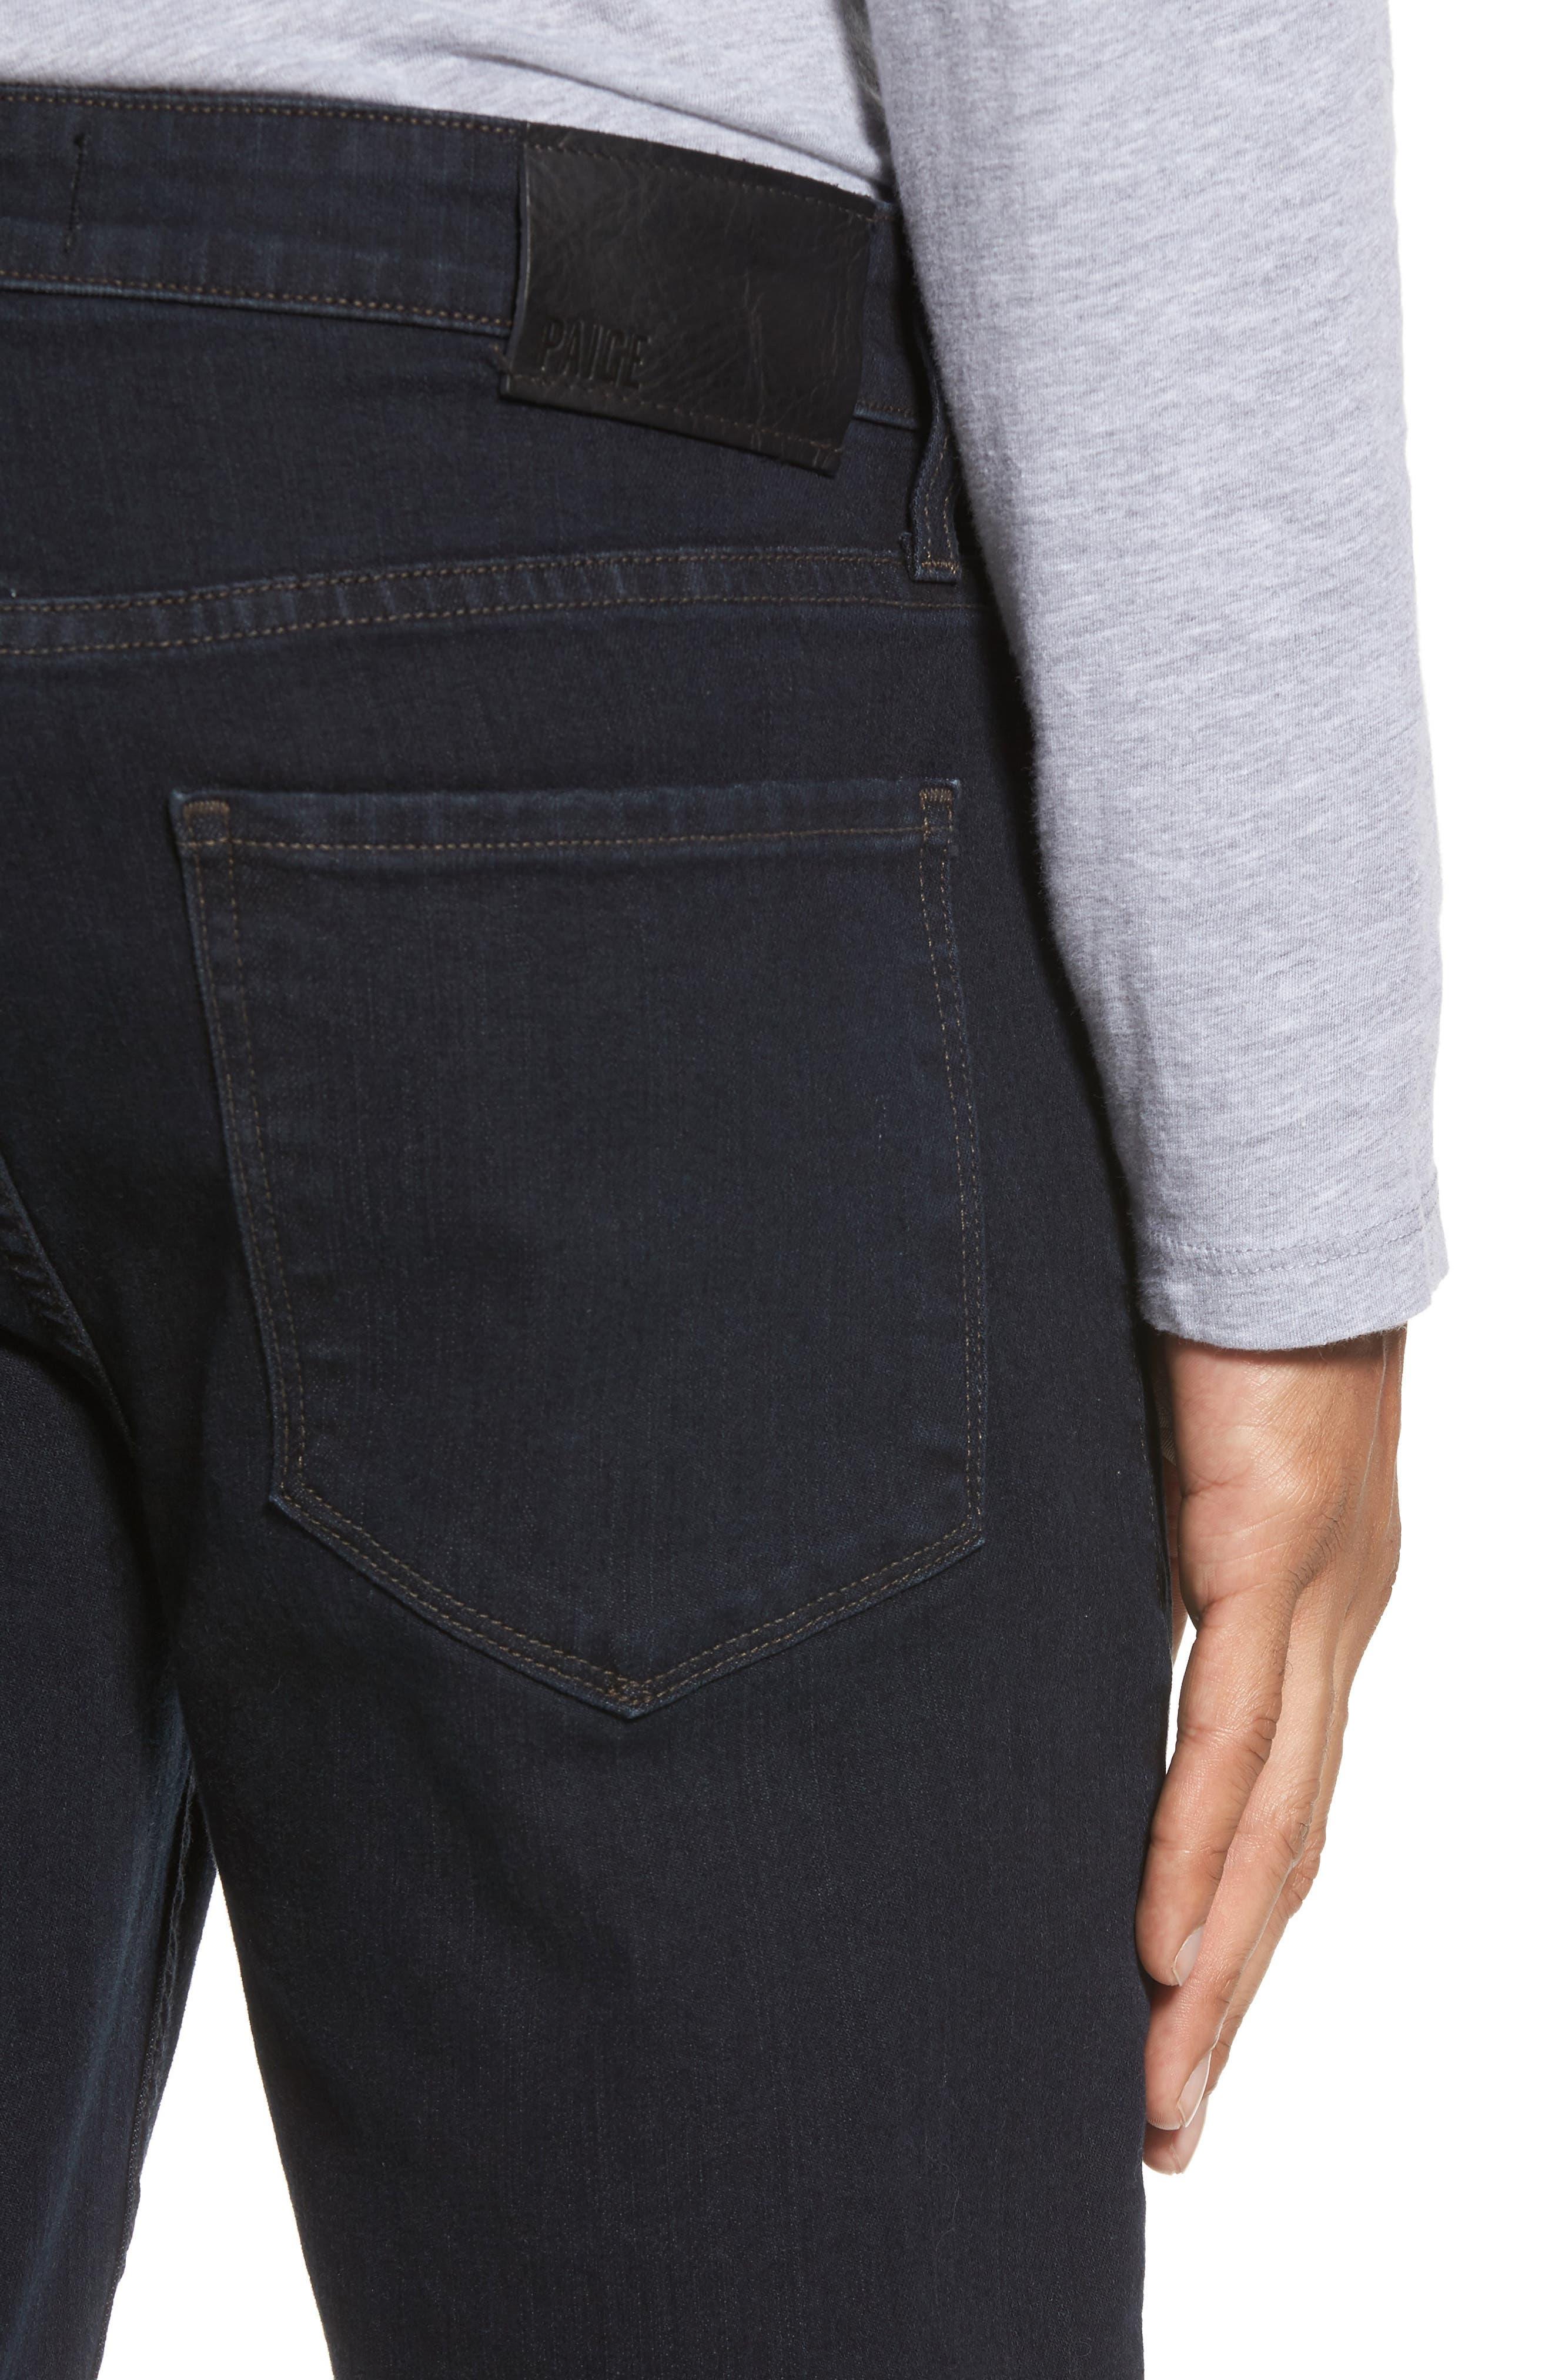 Lennox Slim Fit Jeans,                             Alternate thumbnail 4, color,                             TOMMY